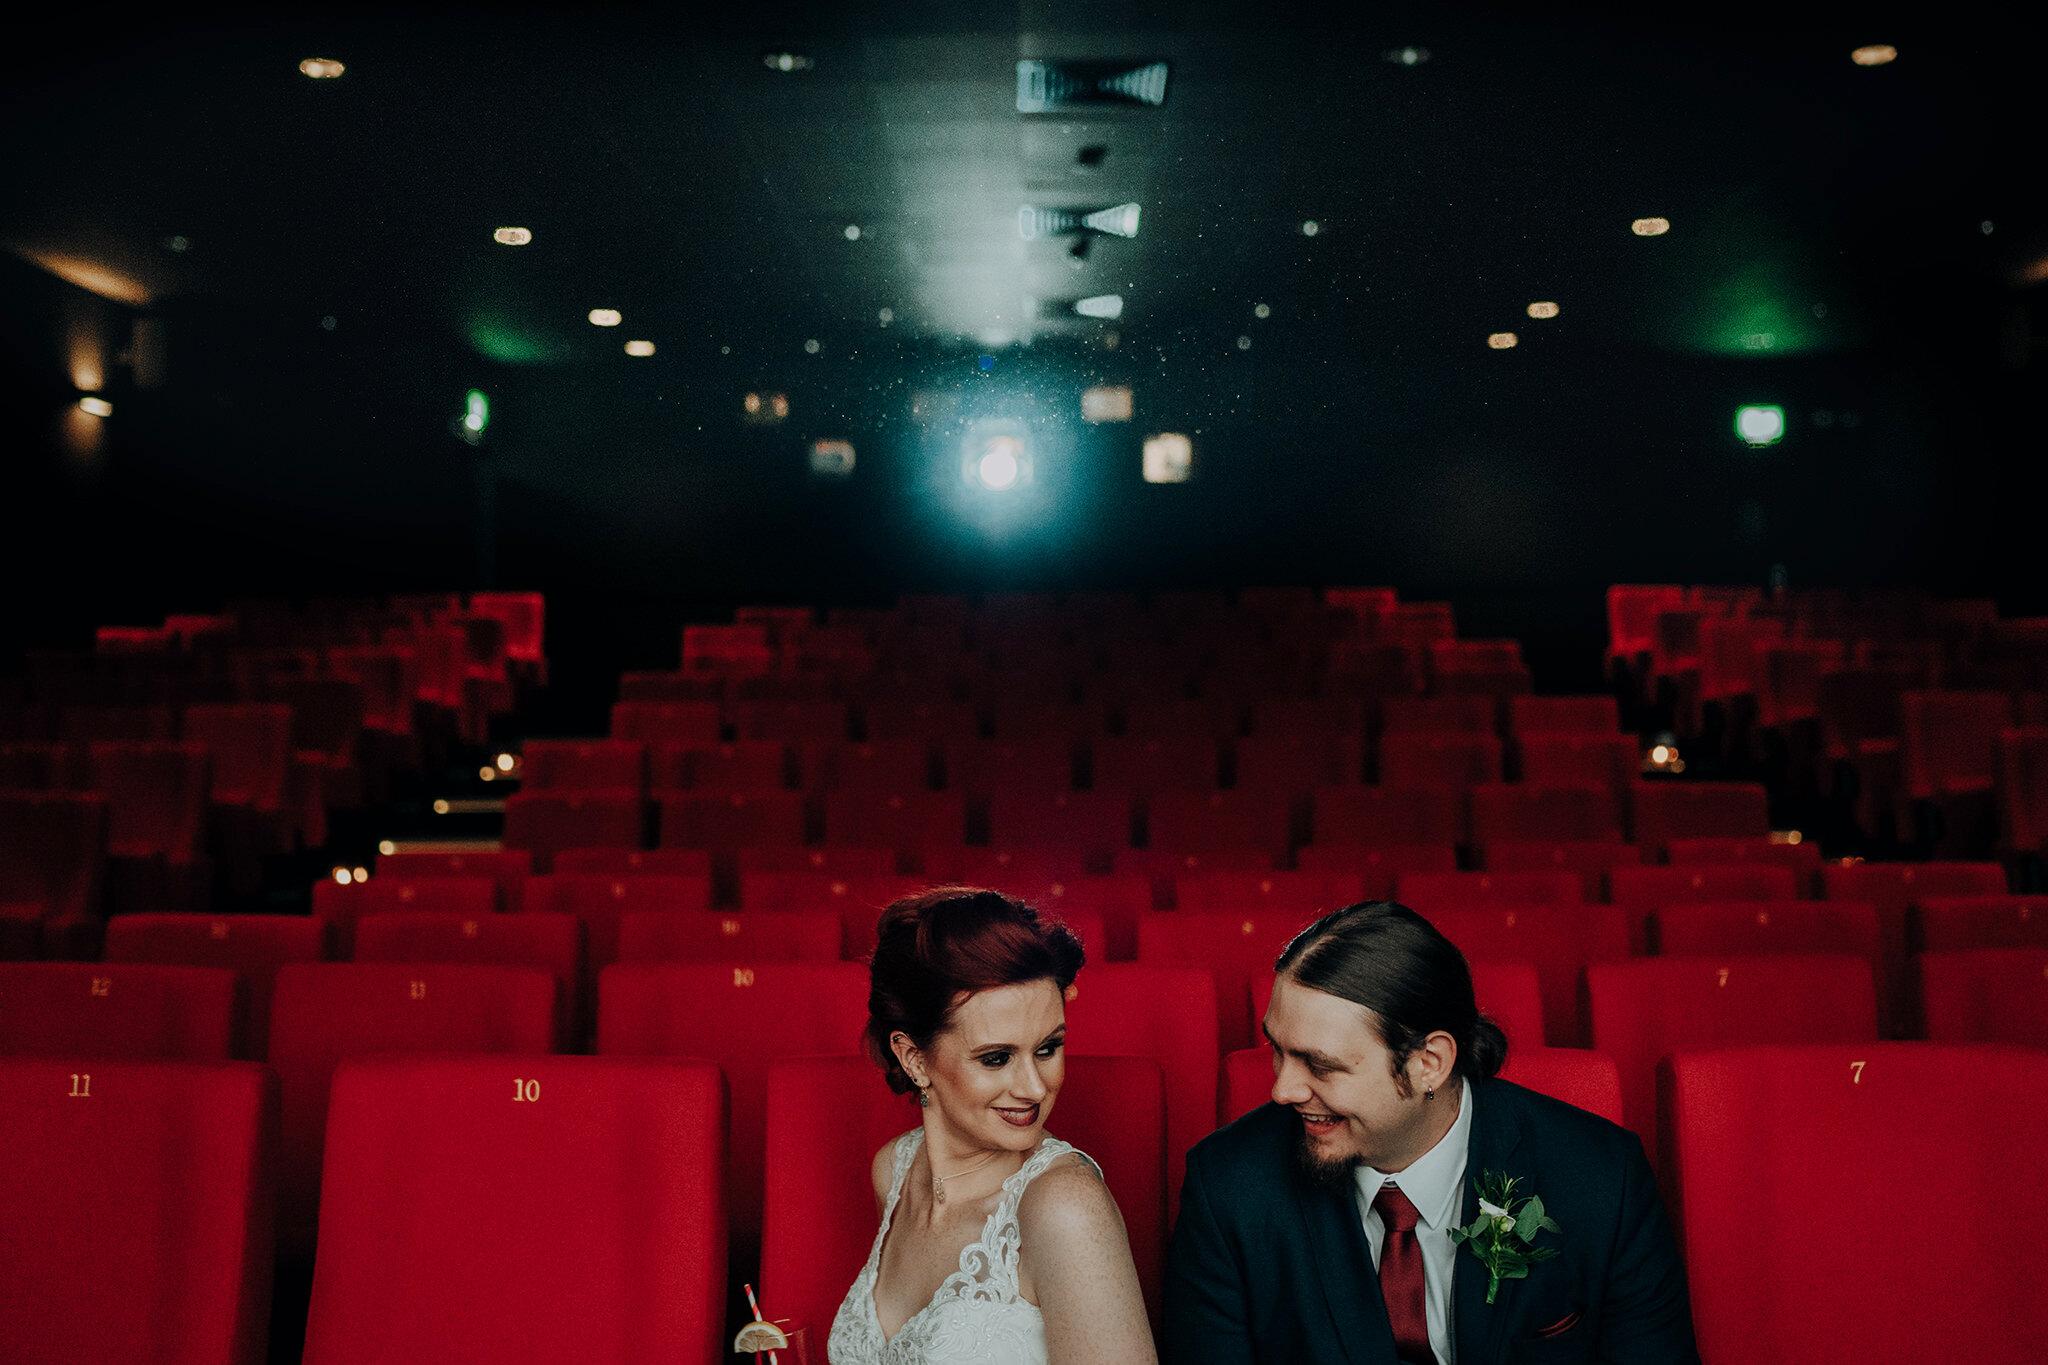 alternative wedding qft belfast - Read more